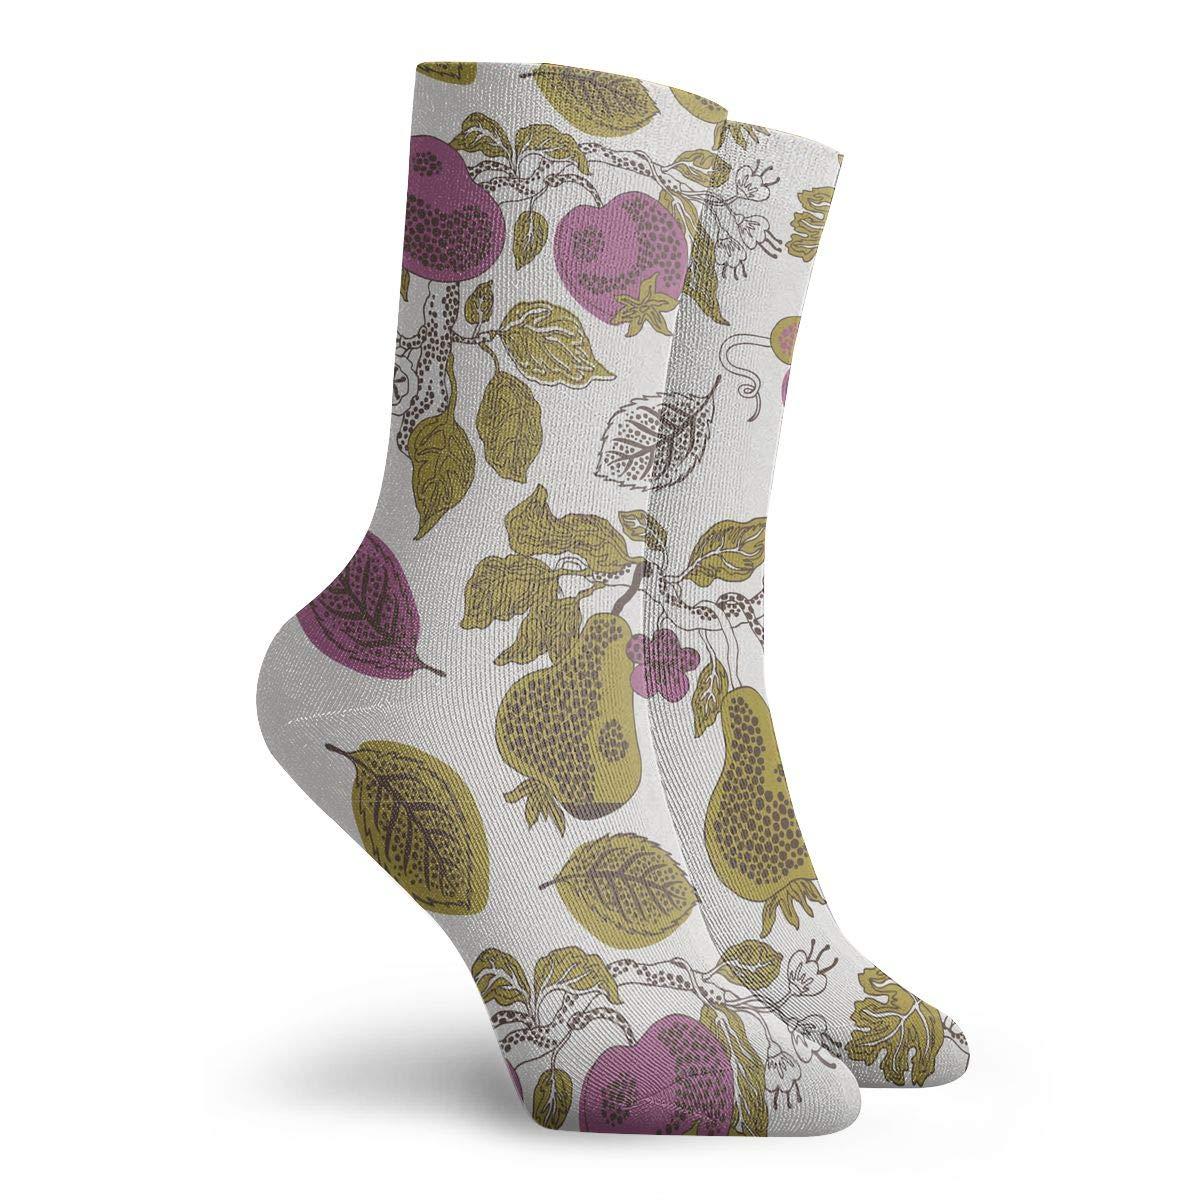 YIEOFH Children Vegetables and Fruit Novelty Boys Girls Fashion Cute Funny Casual Art Crew Socks